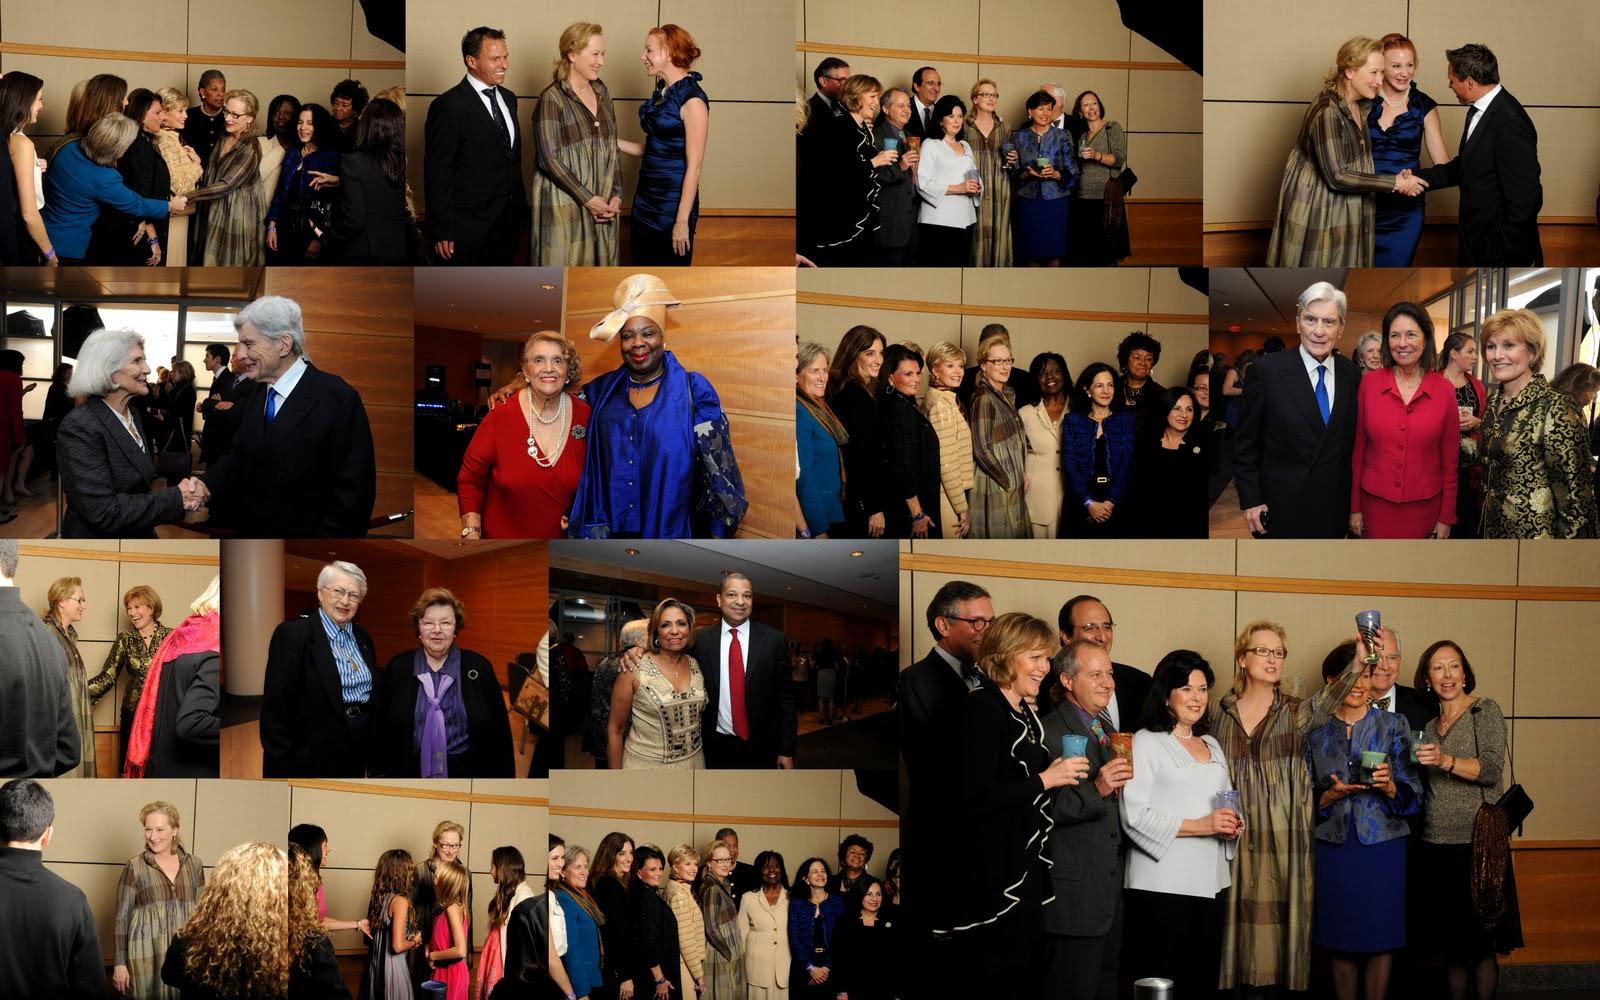 http://2.bp.blogspot.com/-gwXbNltYG-g/TsXP_CM2emI/AAAAAAAAbNk/btTSLs7wvps/s1600/Meryl+Streep+at+the+National+Women%2527s+History+Museum.jpg